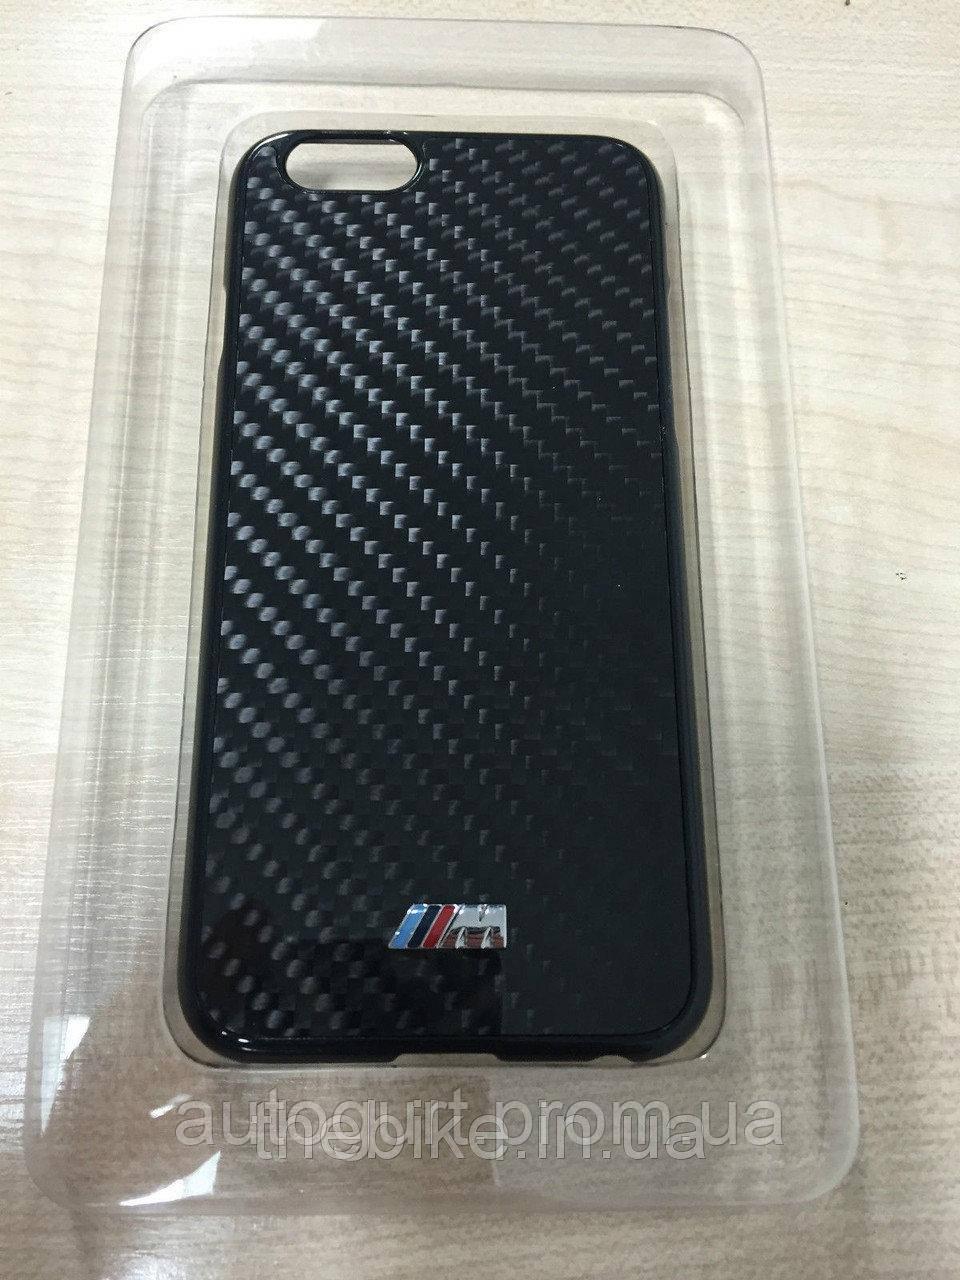 Карбоновый чехол BMW M для iPhone 6 Plus, Hard Case, Black